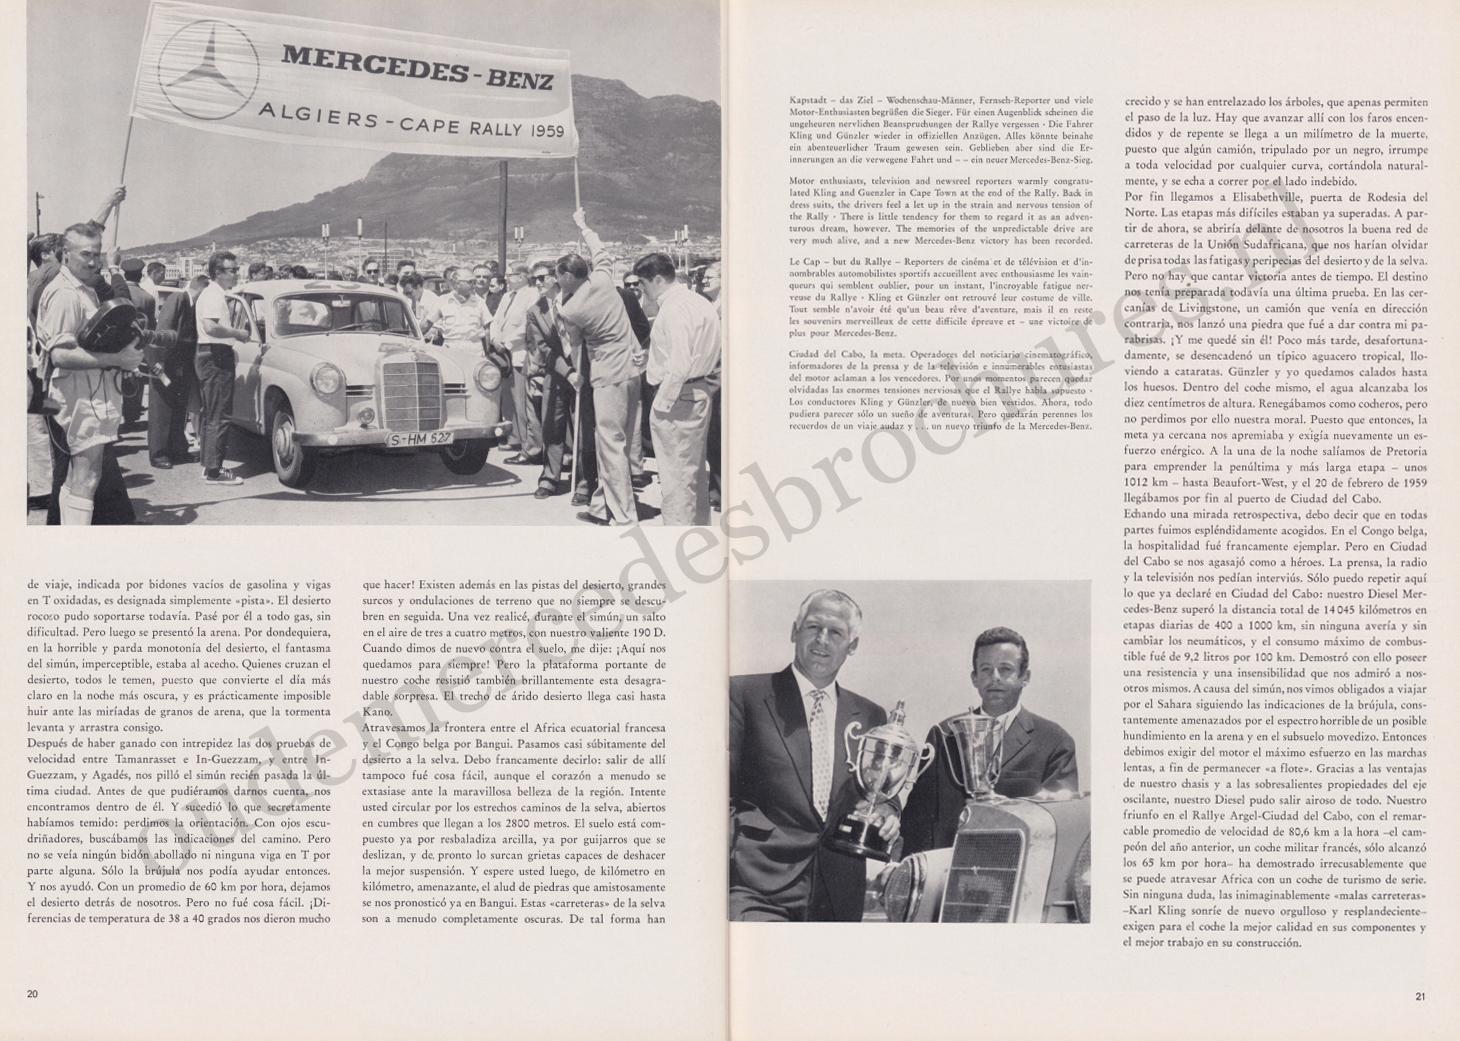 (REVISTA): Periódico In aller welt n.º 31 - Mercedes-Benz no mundo - 1959 - multilingue 011